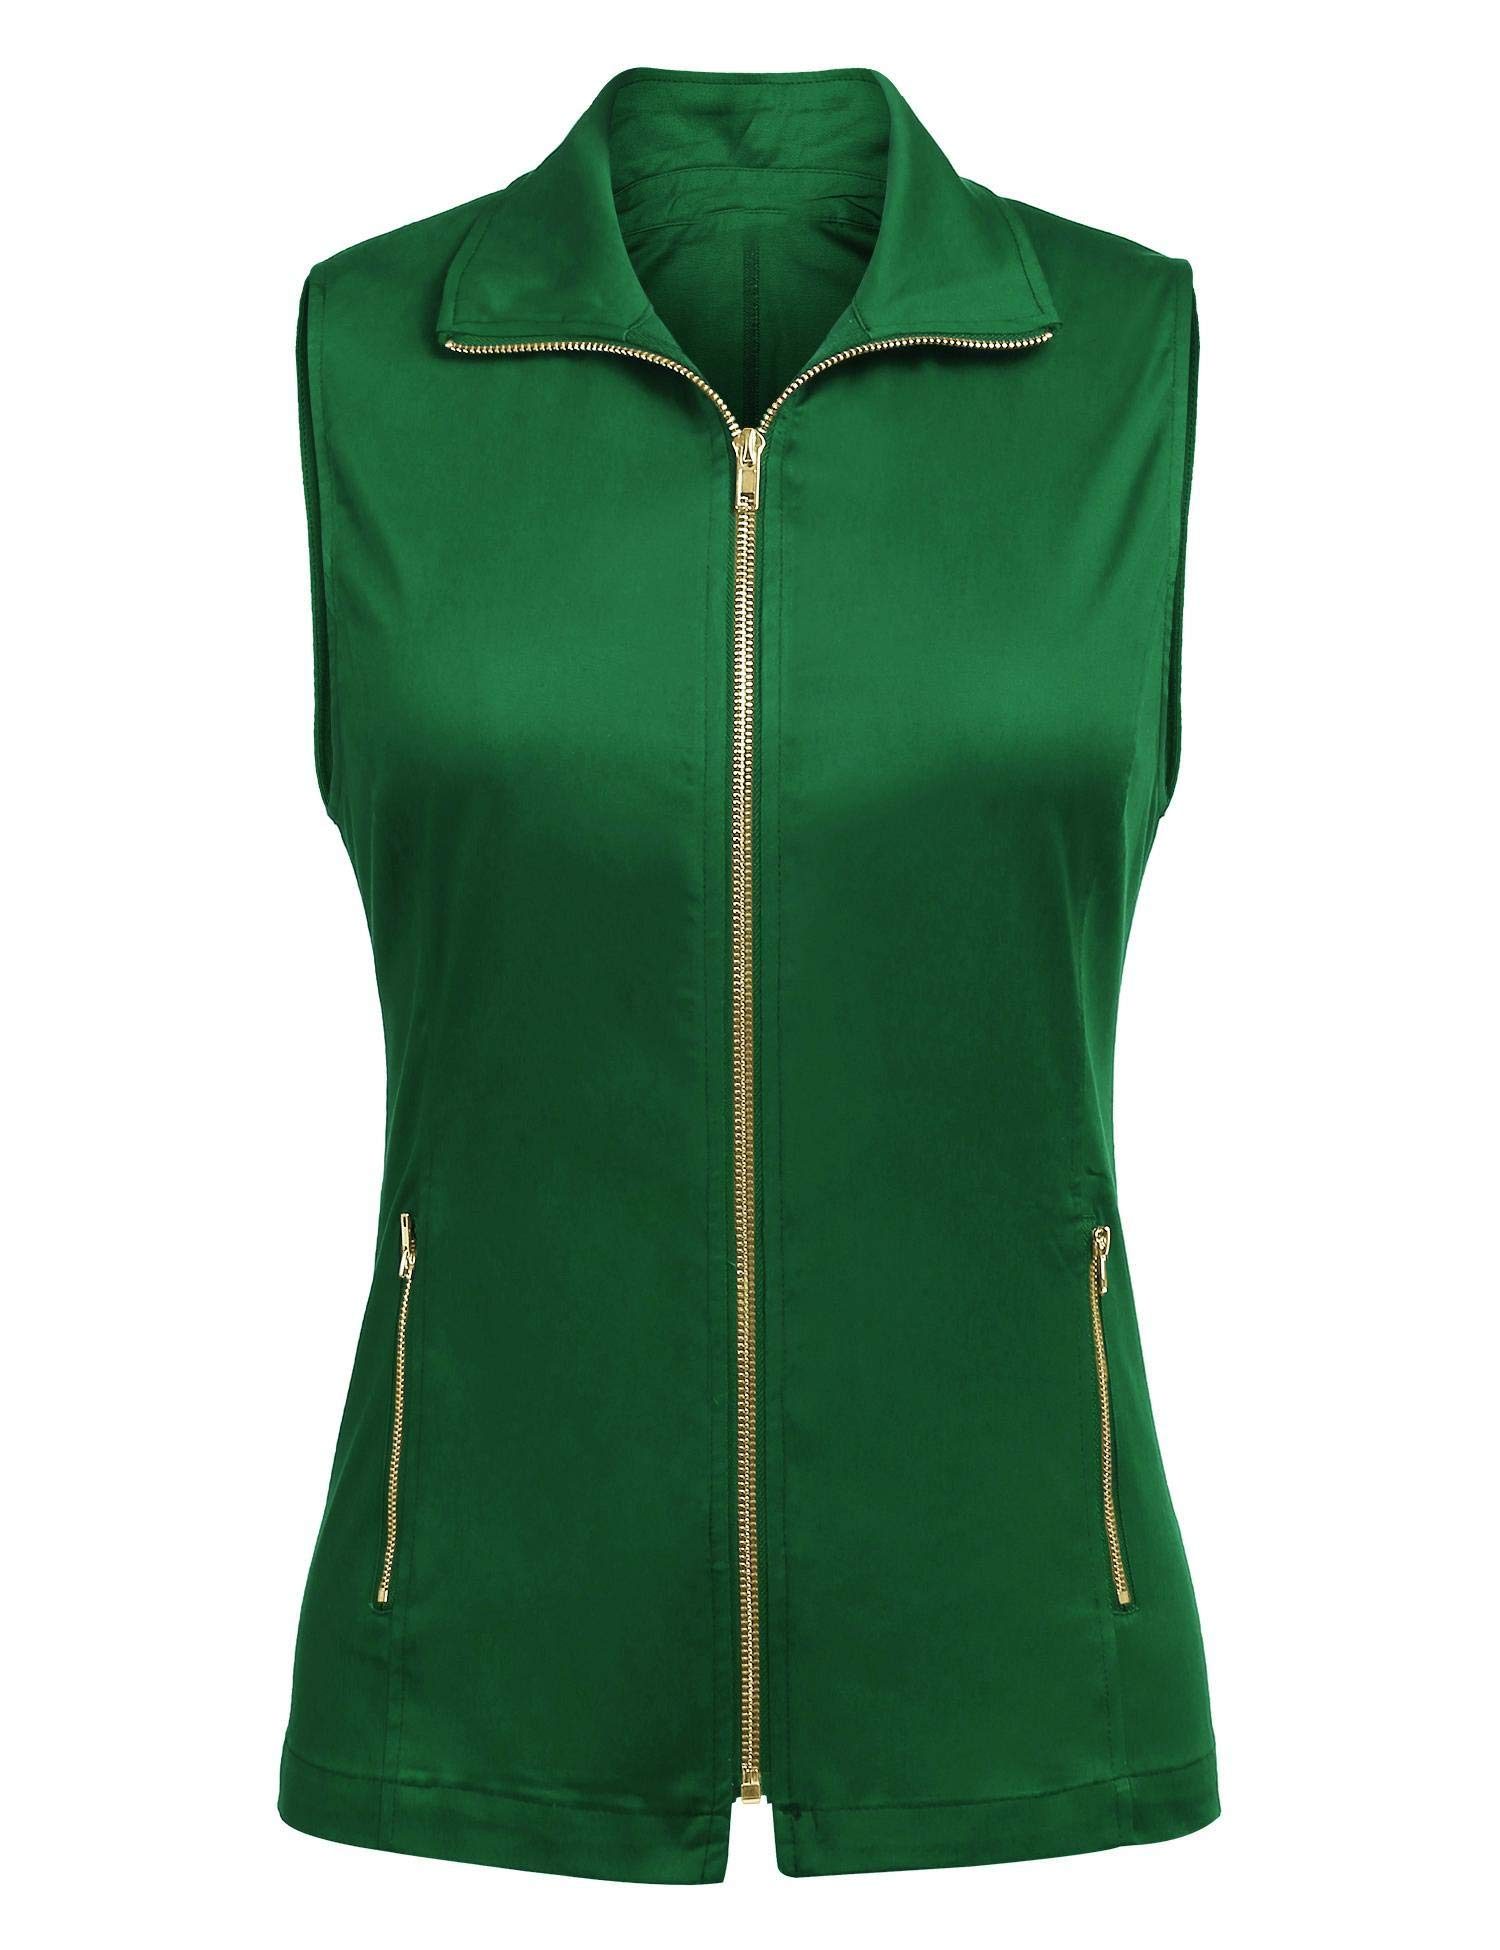 Dealwell Womens Lightweight Sleeveless Military Anorak Drawstring Jacket Vest (Onion Green Pale Green S) by Dealwell